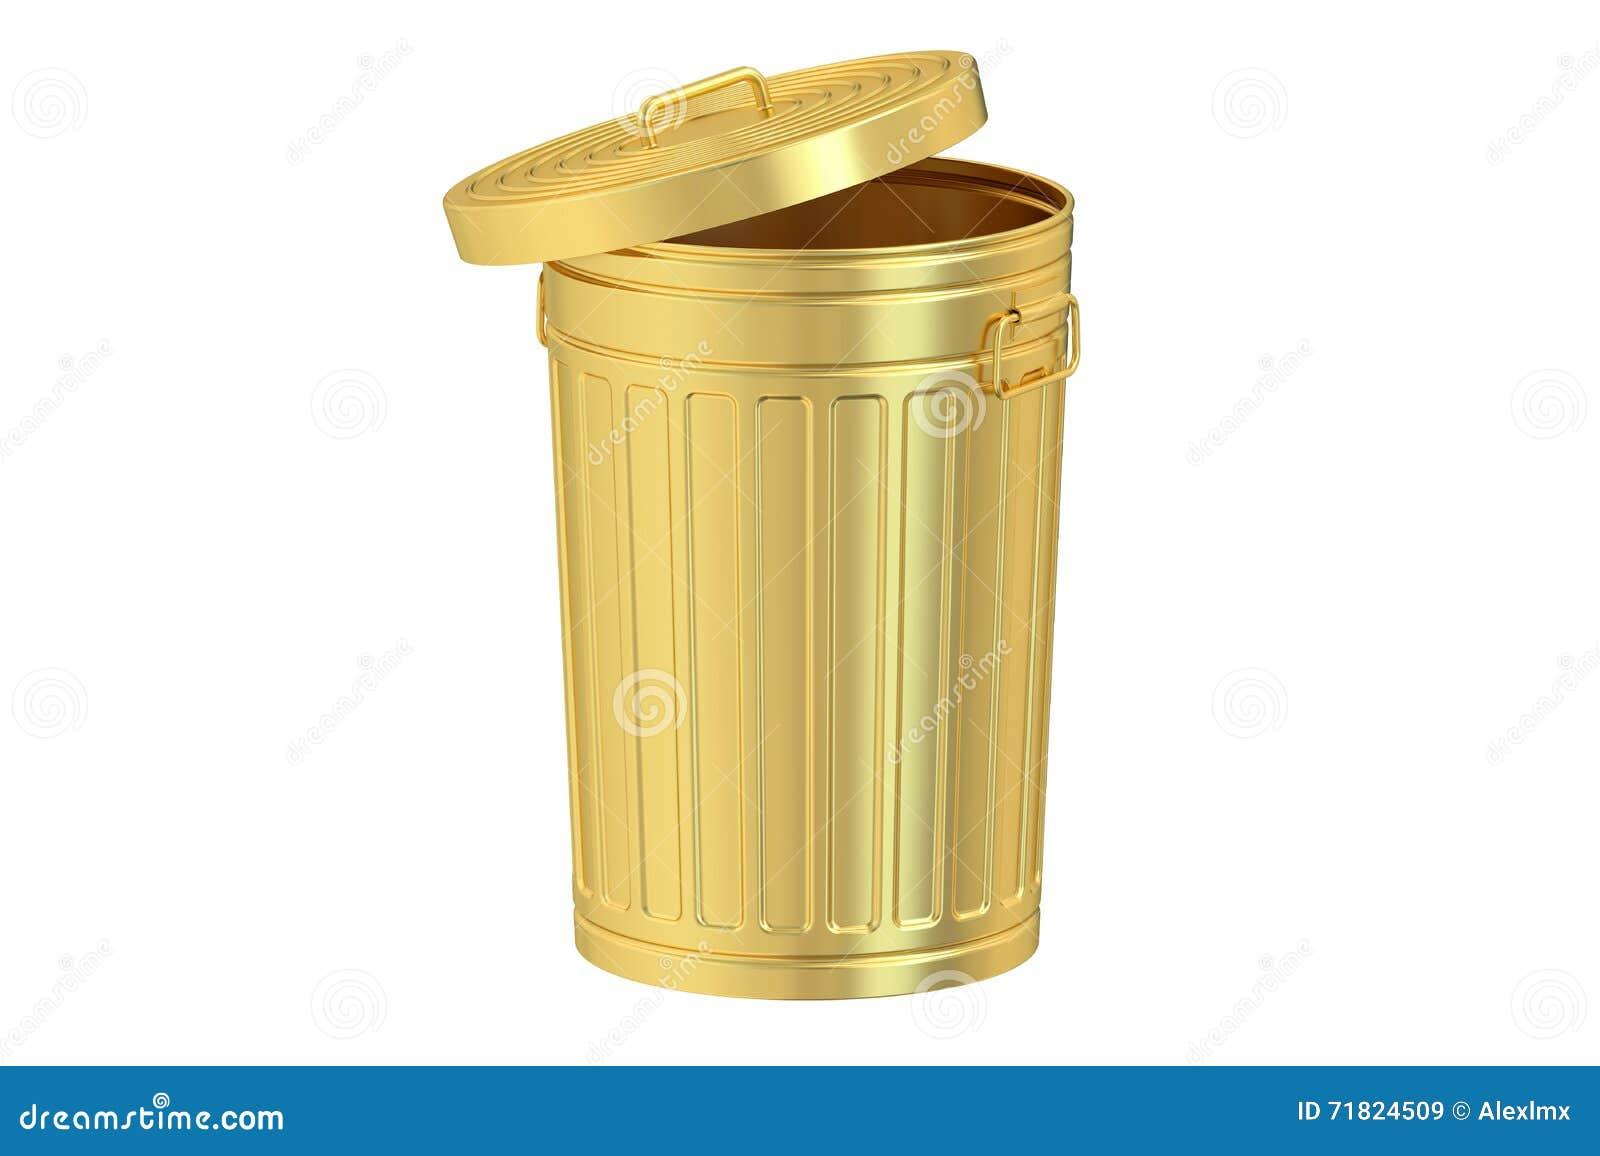 Golden Garbage Can 3d Rendering Stock Illustration